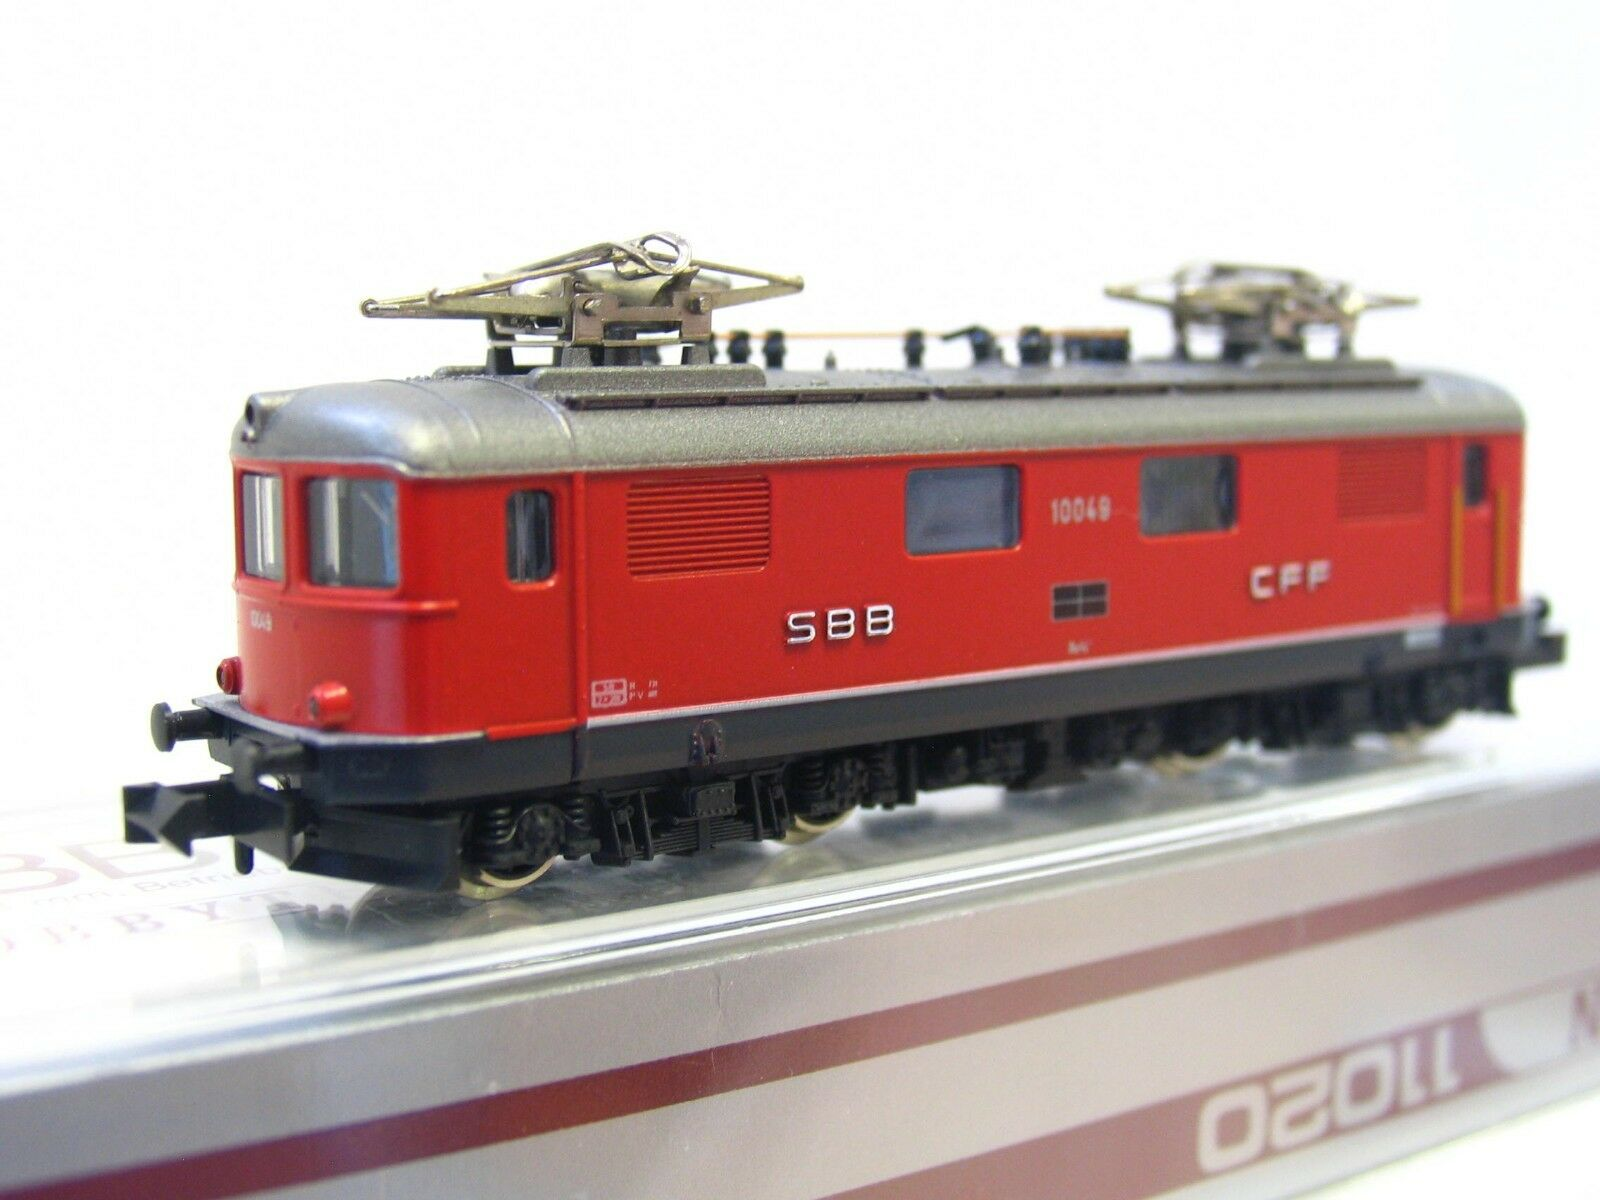 Hobbytrain N 11020 E-Locomotive Re 4 4 10049 SBB CFF OVP (v9957)